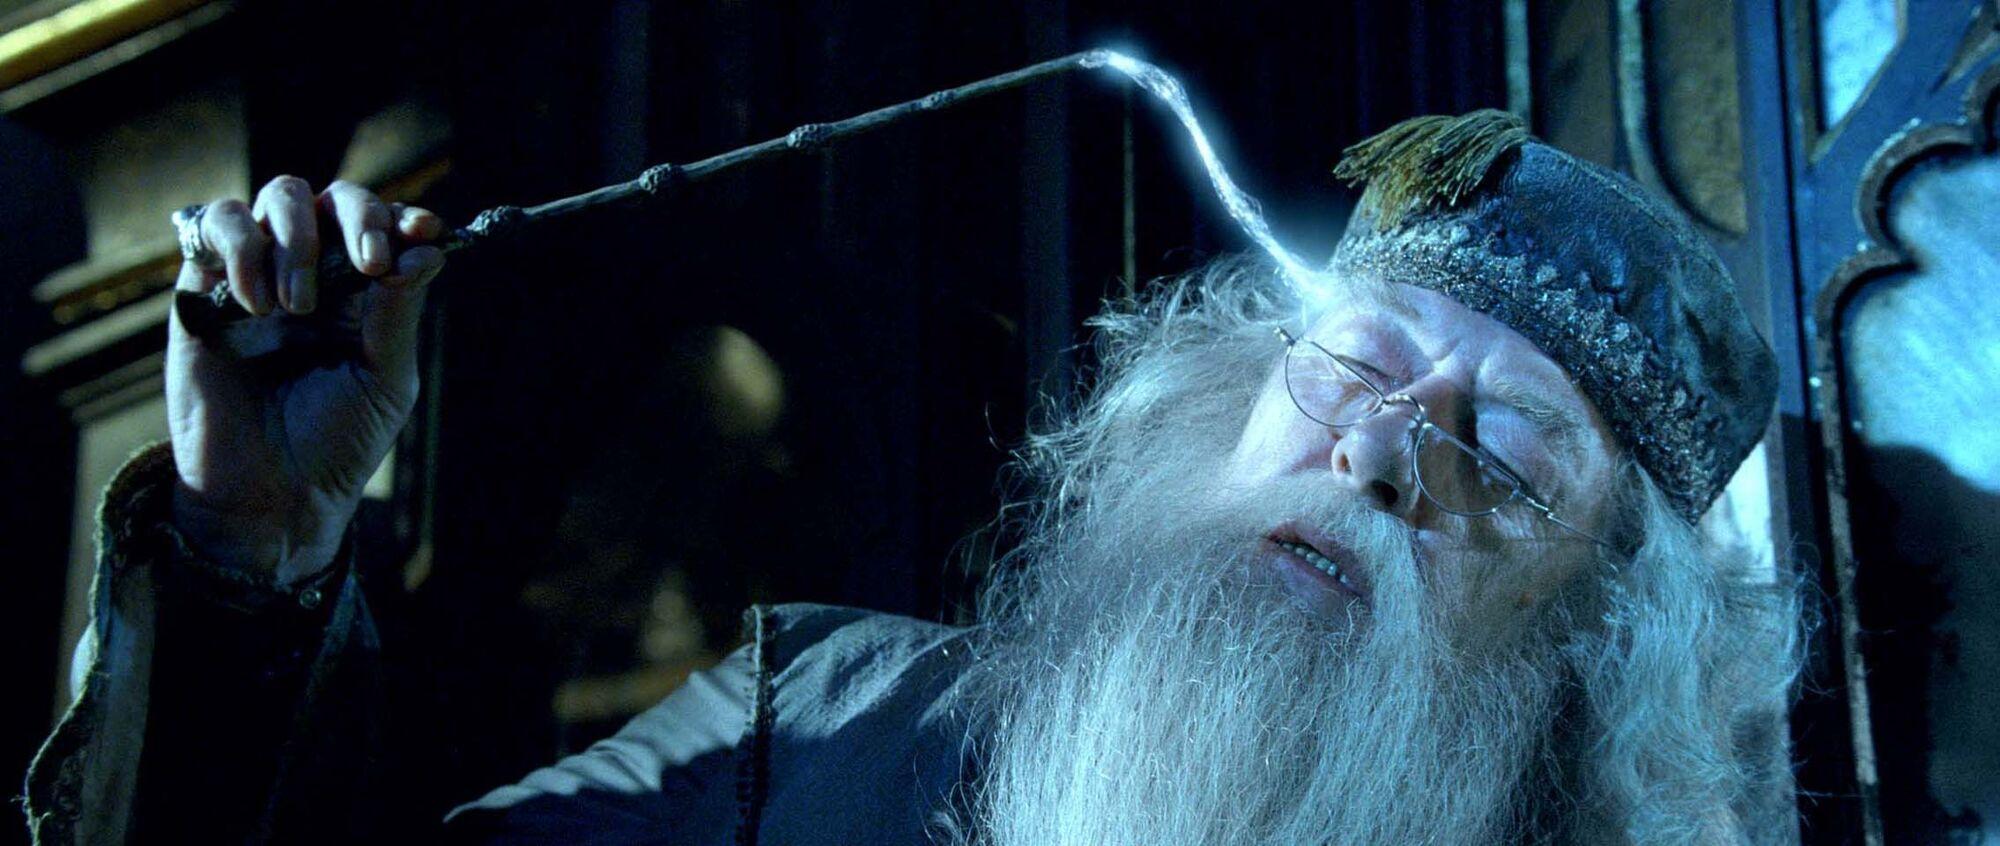 https://vignette4.wikia.nocookie.net/harrypotter/images/d/d8/Dumbledore_Memory.jpg/revision/latest/scale-to-width-down/2000?cb=20110529183928&path-prefix=ru